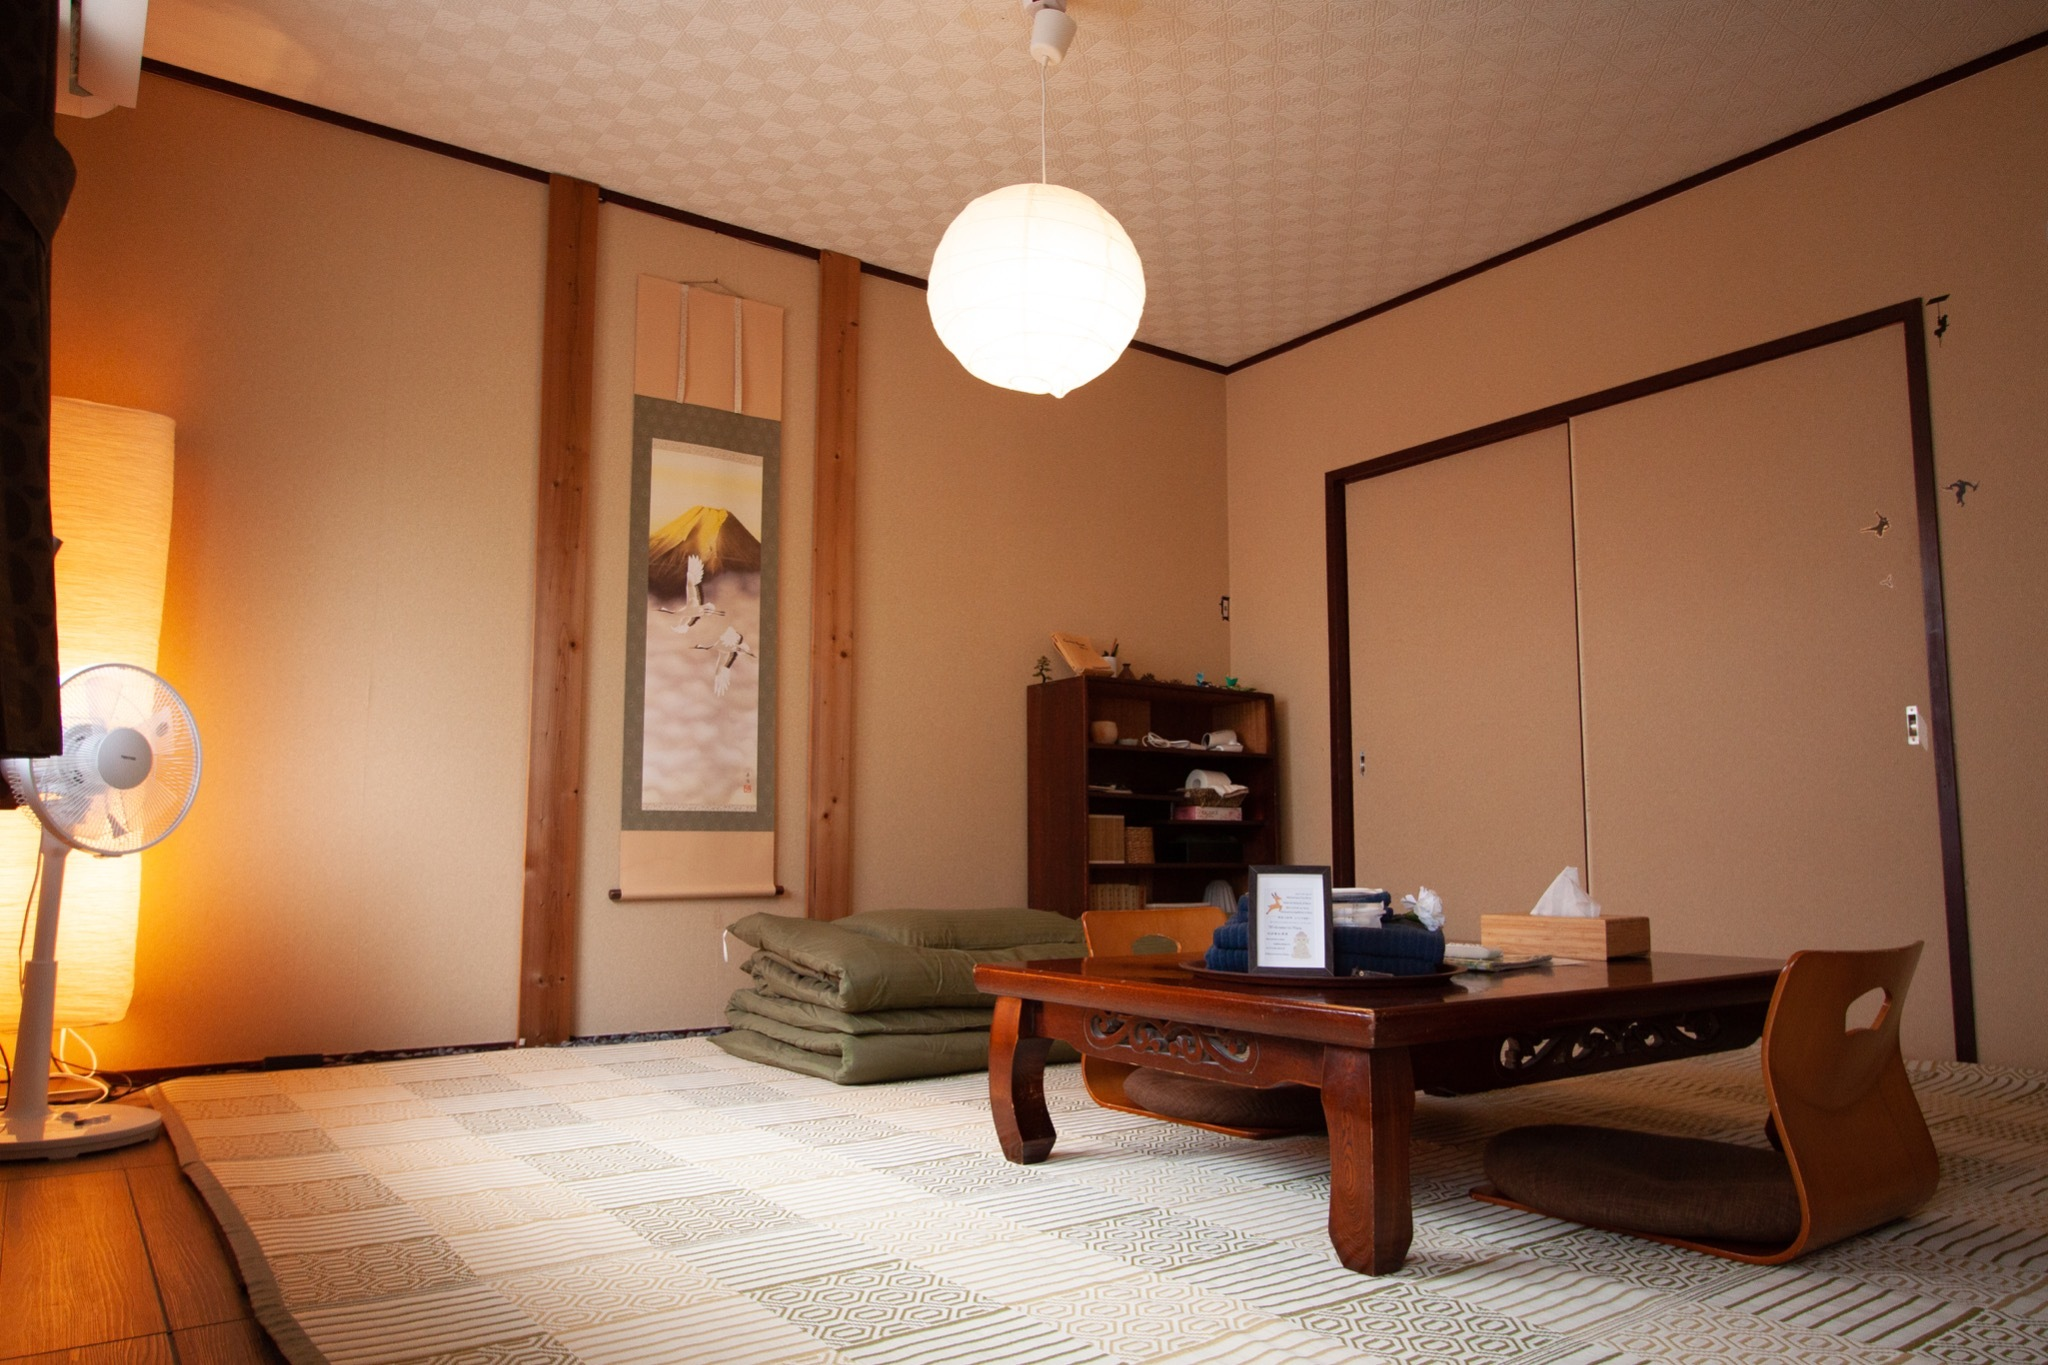 JPN room : 奈良公園近く!改装済みバスルームの綺麗なお部屋